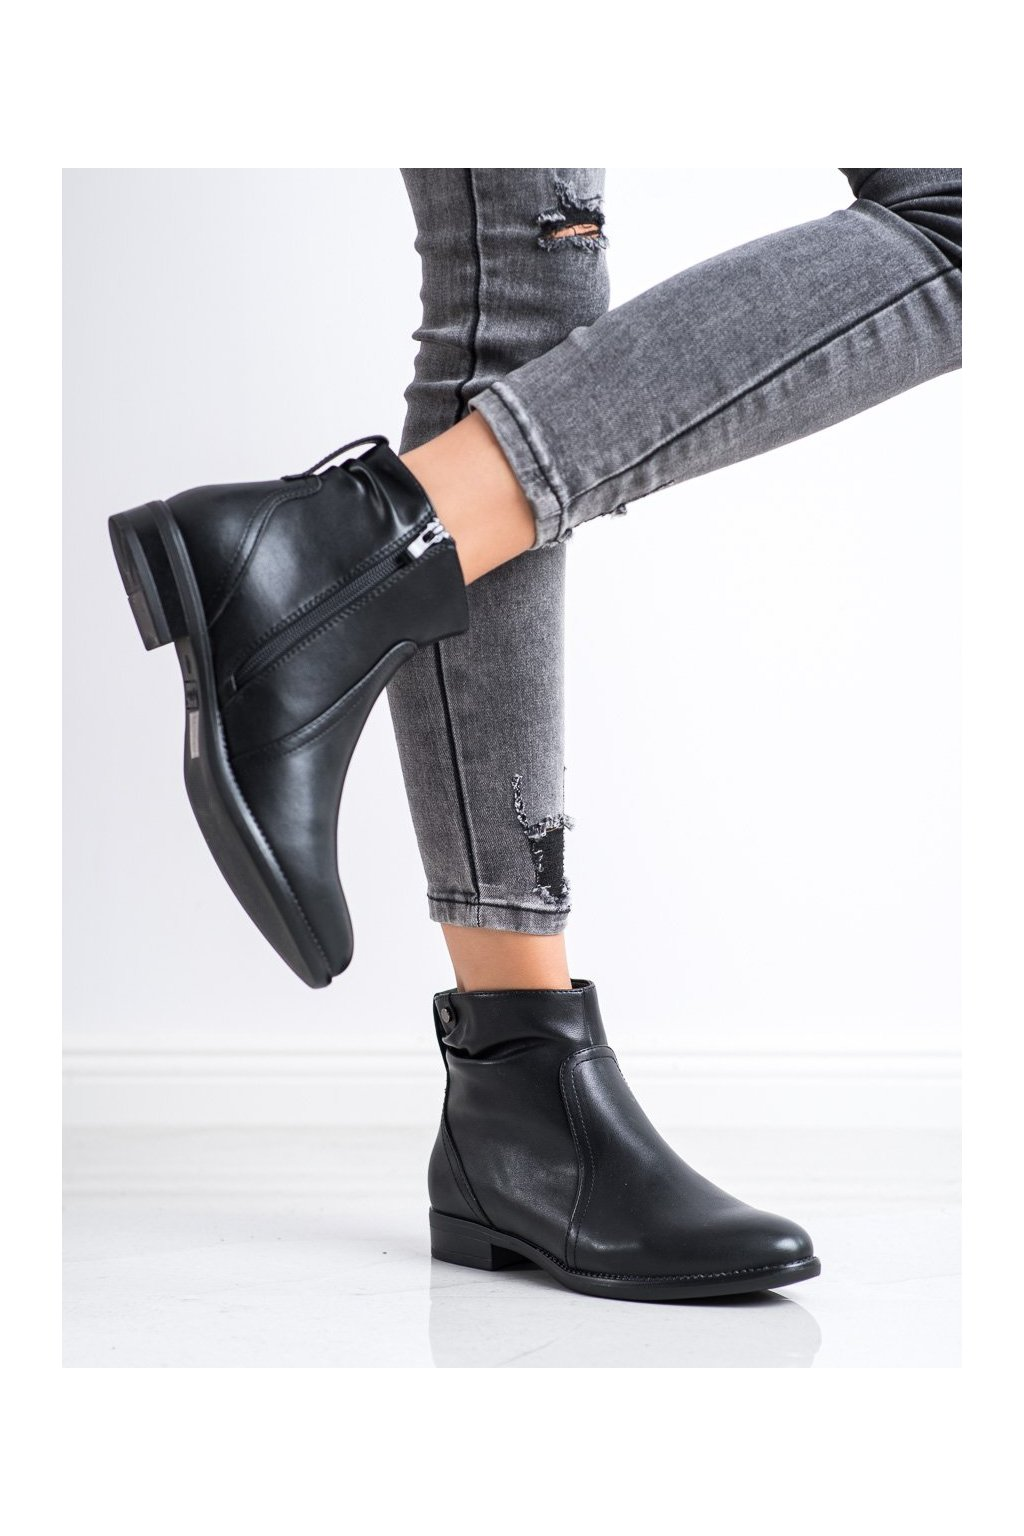 Čierne dámske topánky Sergio leone kod BT504B